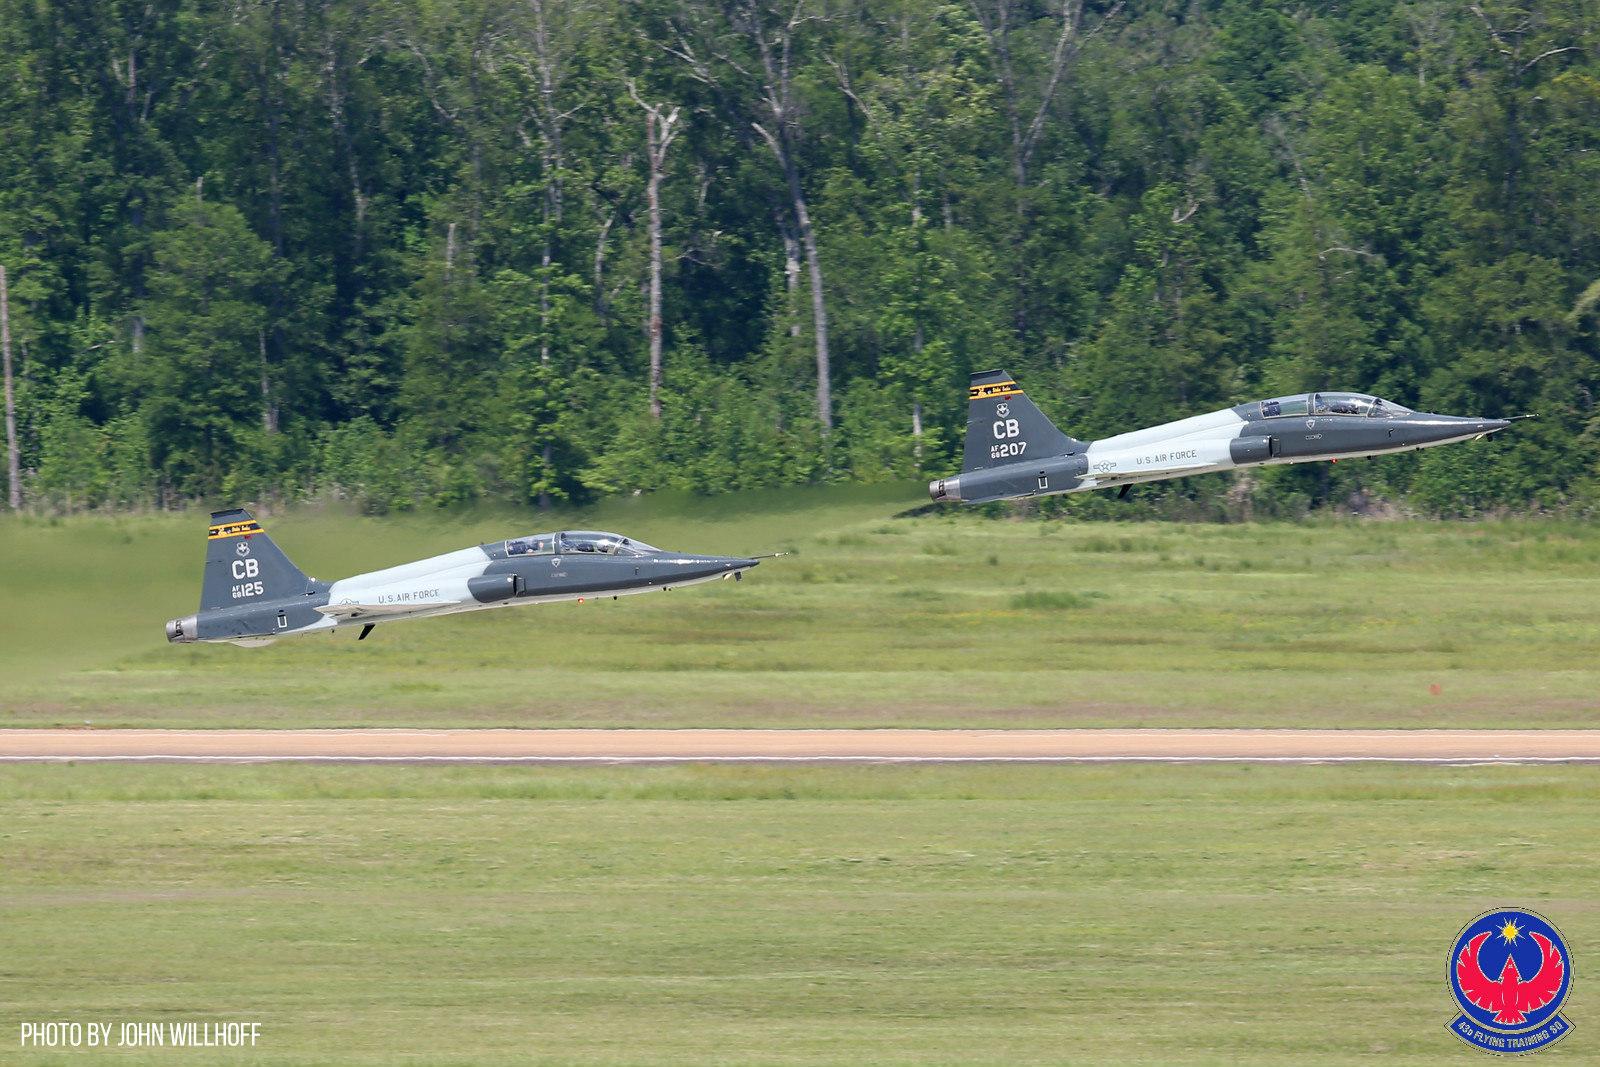 Advanced Pilot Training in The T-38 Talon At Columbus Air Force Base